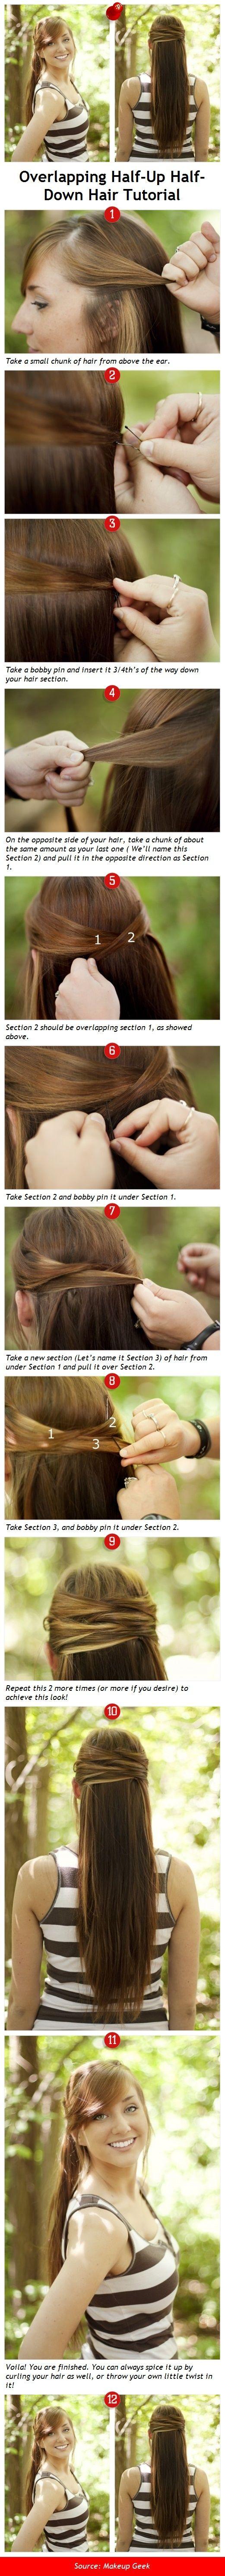 Overlapping halfup halfdown hairstyles pinterest hair style